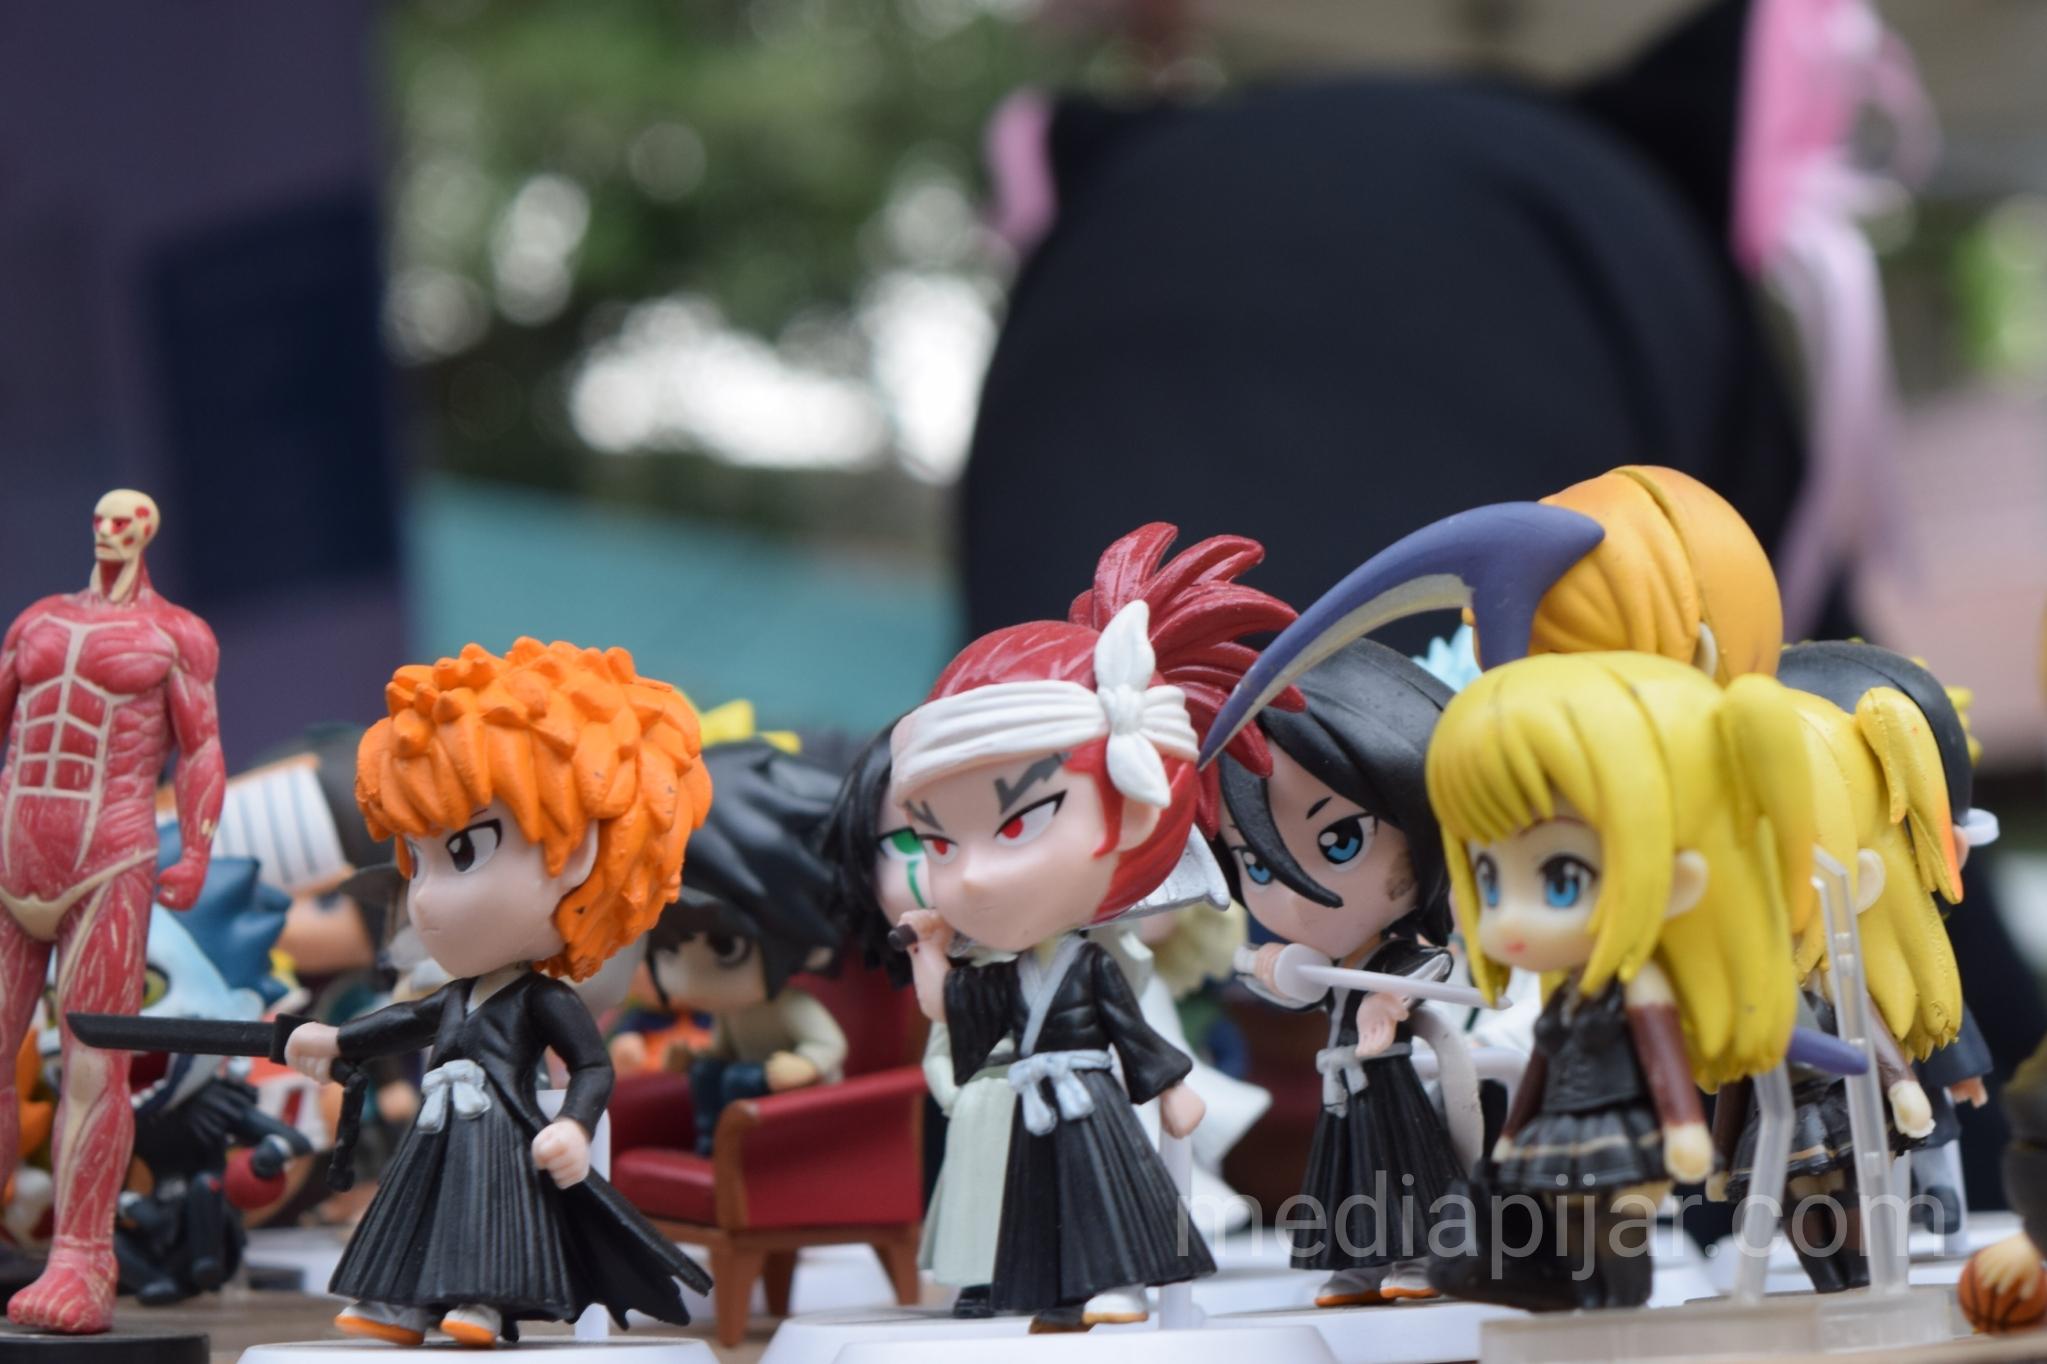 Action Figure dari anime-anime Jepang dalam acara Little Akihabara. (17/3) (Fotografer: Kartika Oktarija)